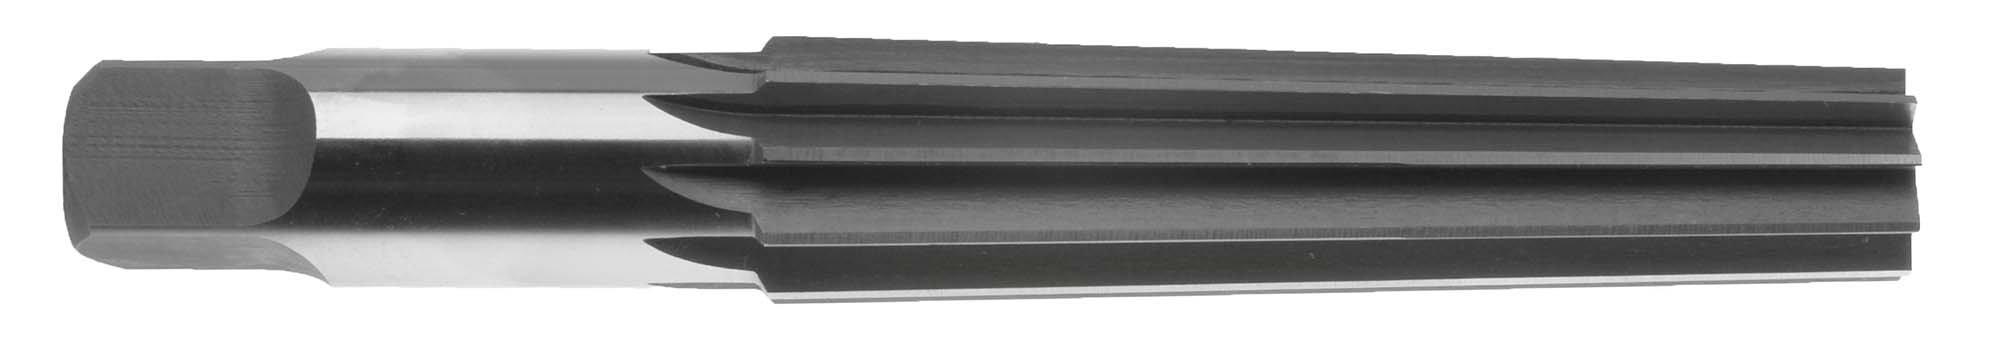 1 MT Morse Taper Hand Finishing Reamer, High Speed Steel